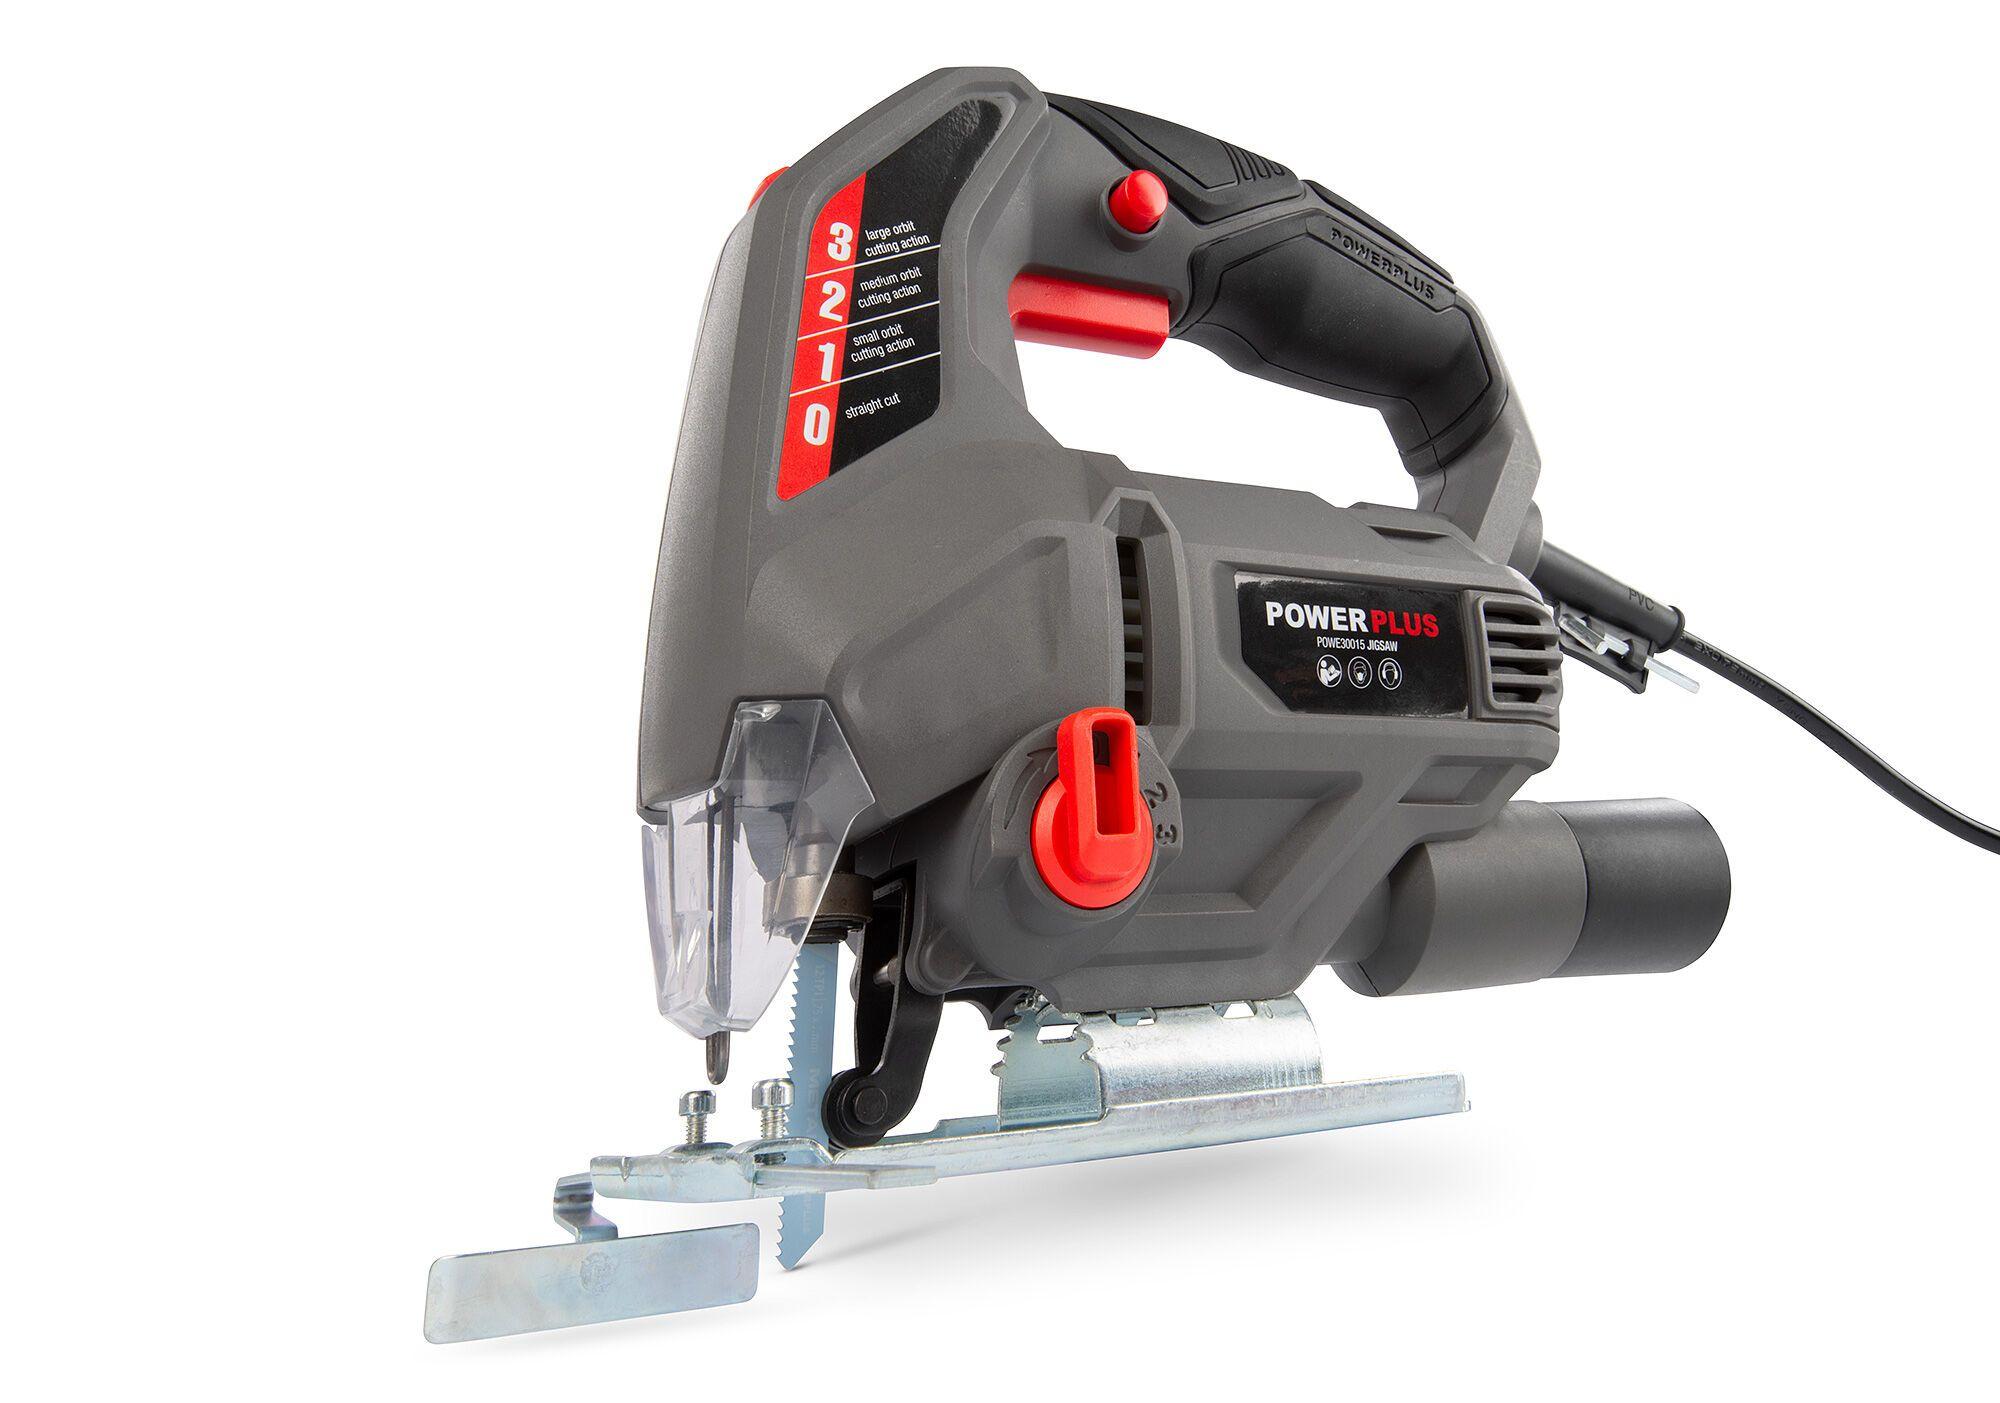 Powerplus POWE30015 Decoupeerzaag 710W | Wipzaag met laser